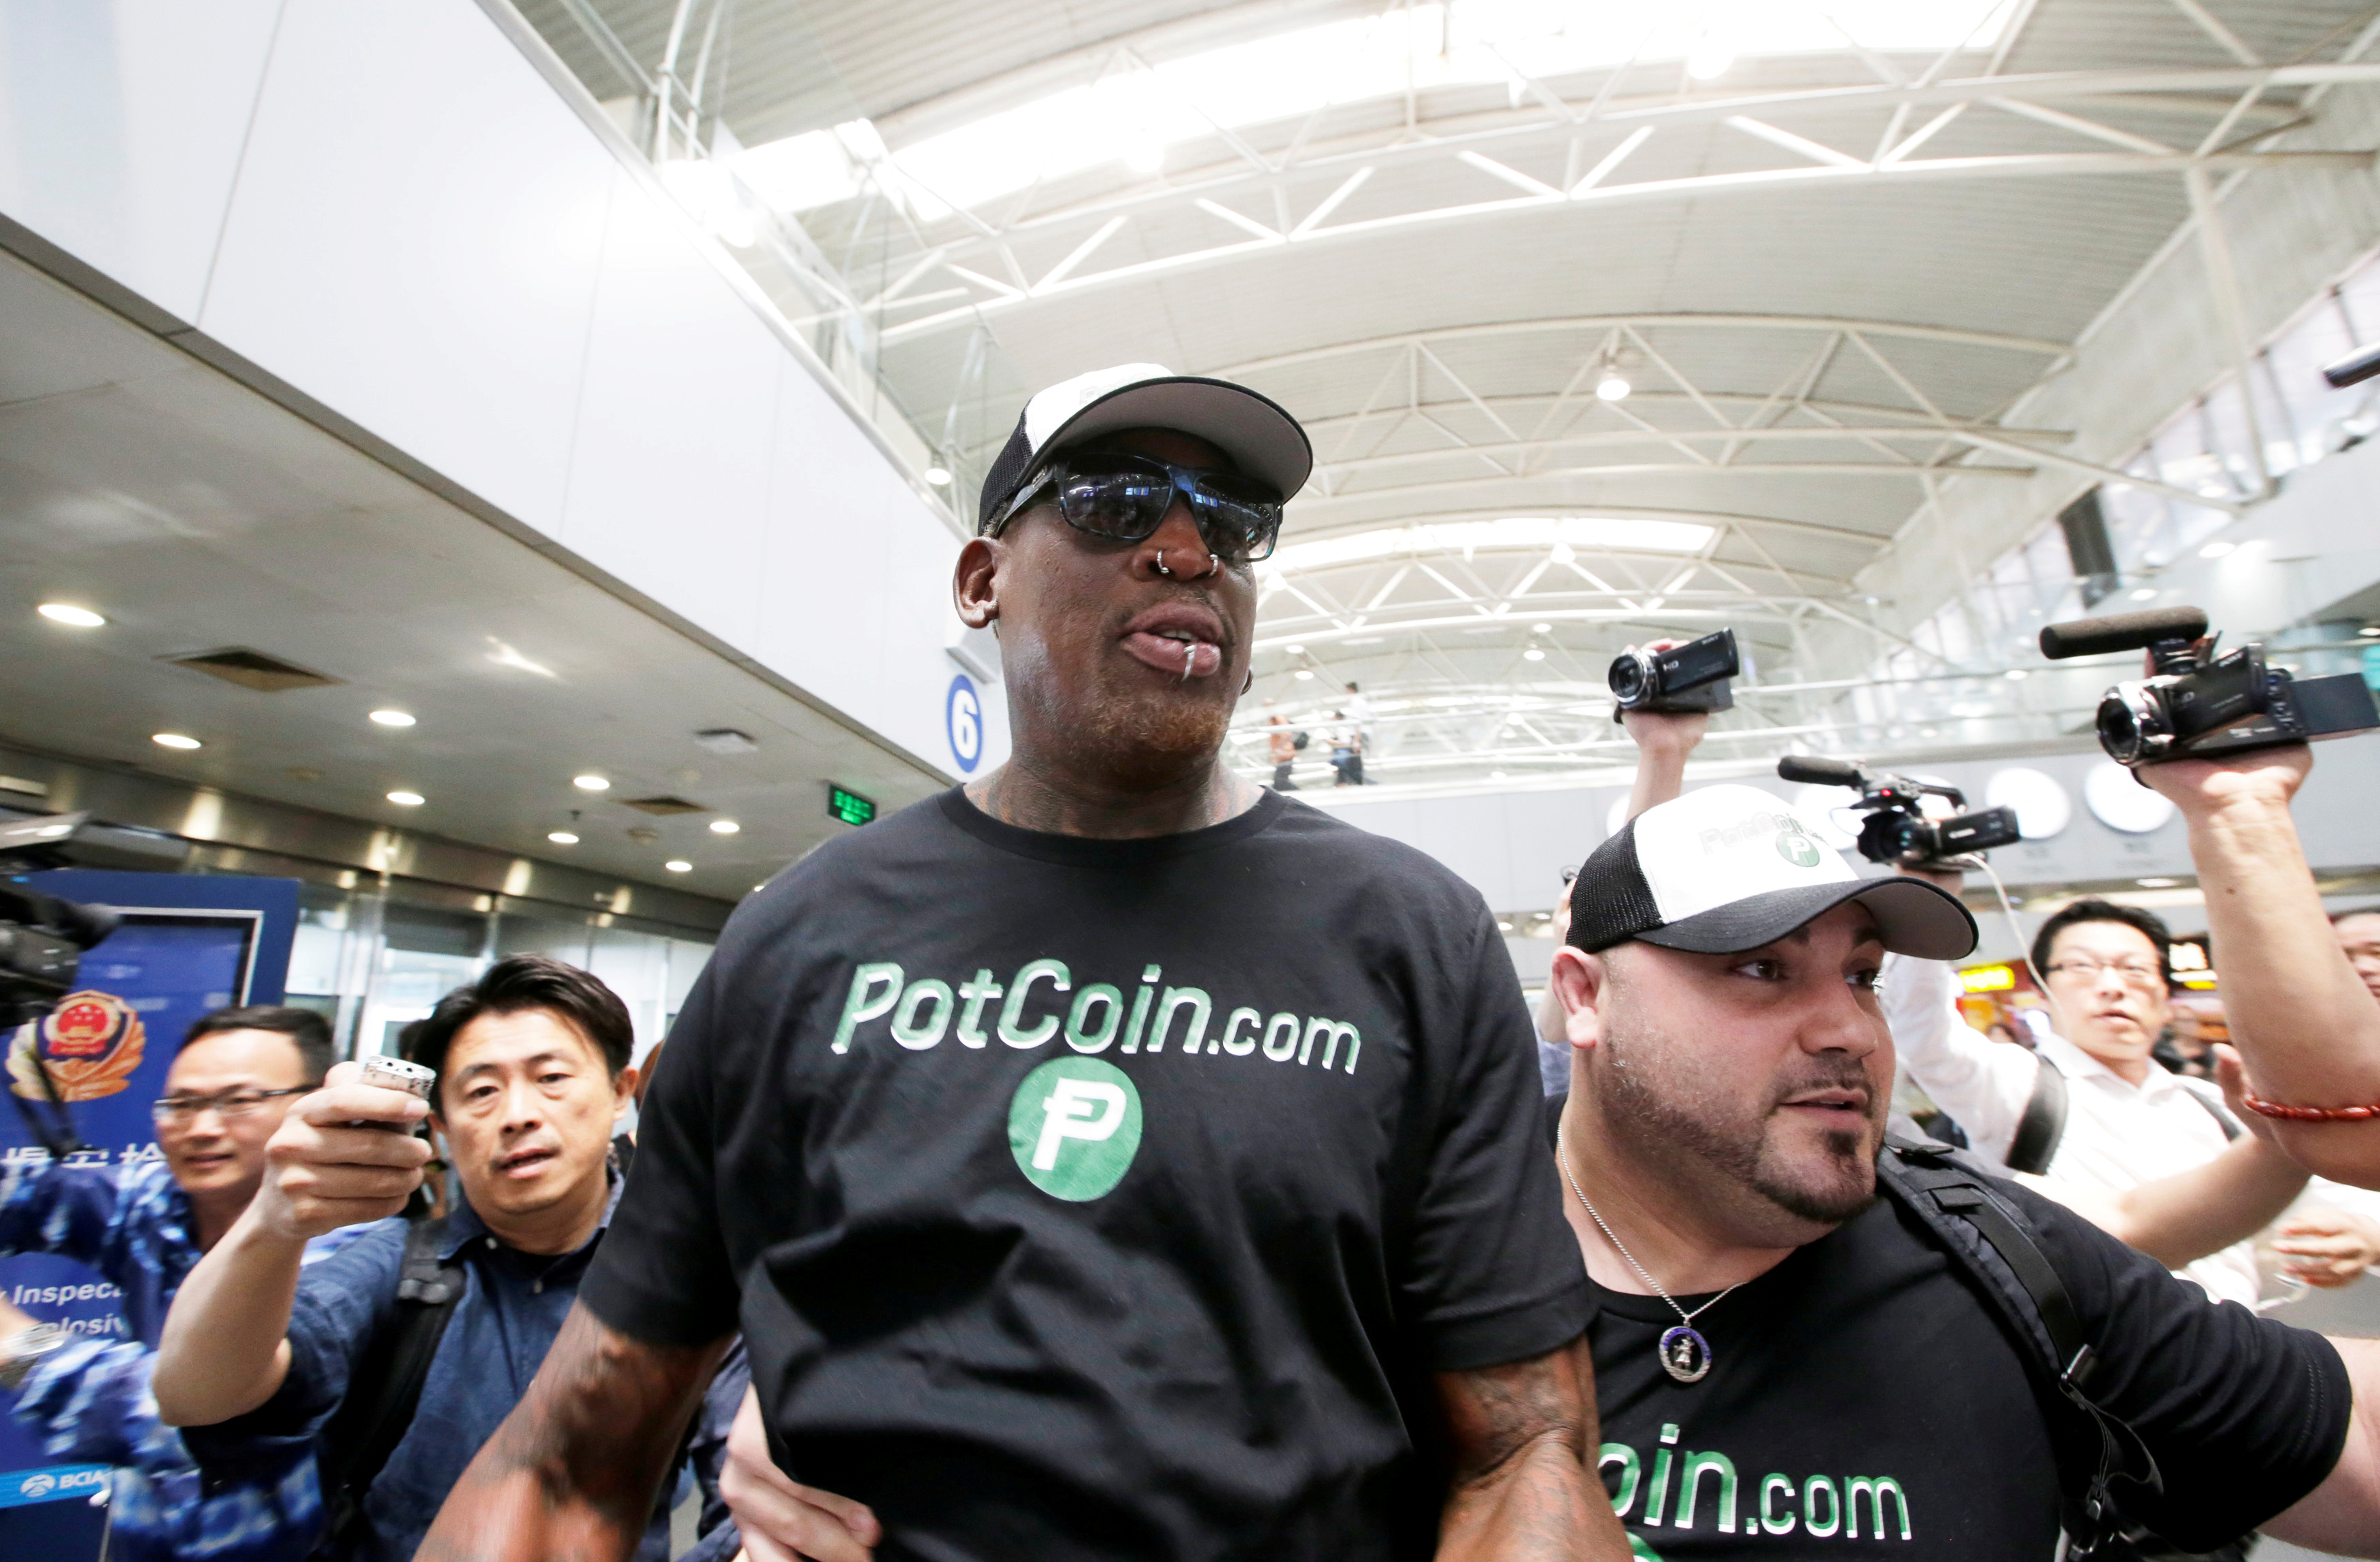 Former NBA basketball player Dennis Rodman arrives at Beijing Capital International Airport as he leaves for North Korea's Pyongyang, in Beijing, China, June 13, 2017.